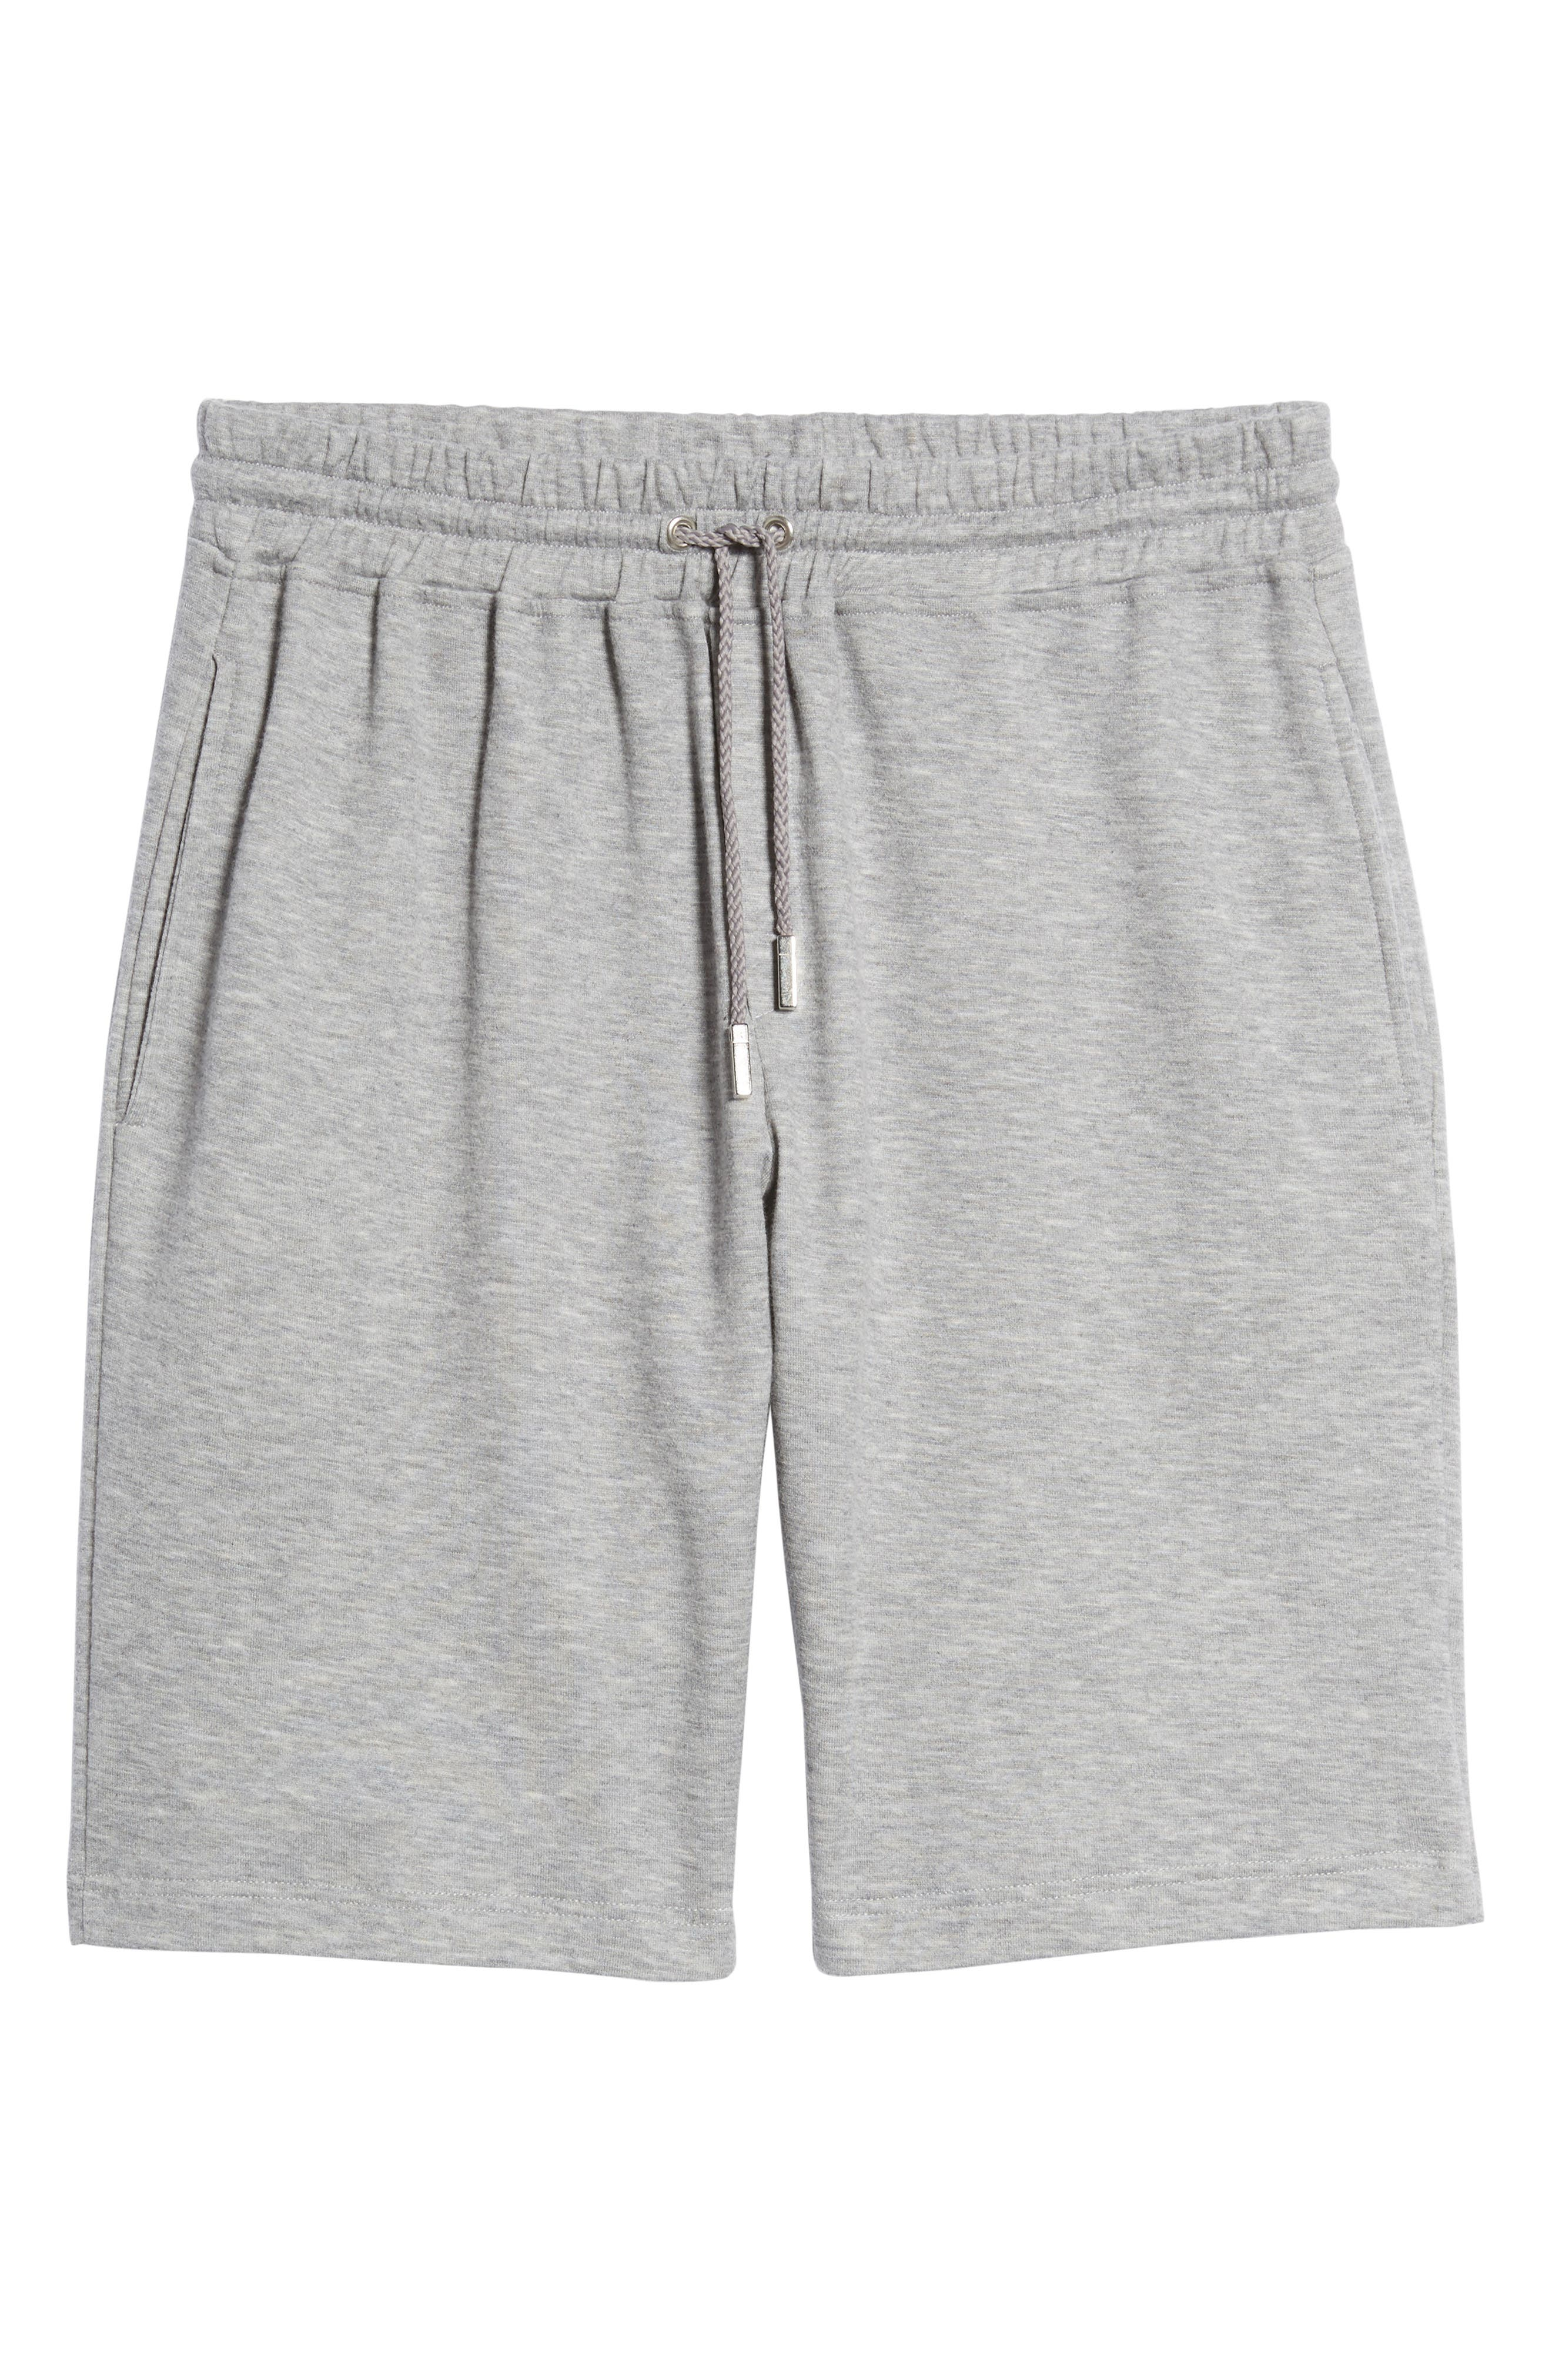 Drawstring Knit Shorts,                             Alternate thumbnail 6, color,                             020